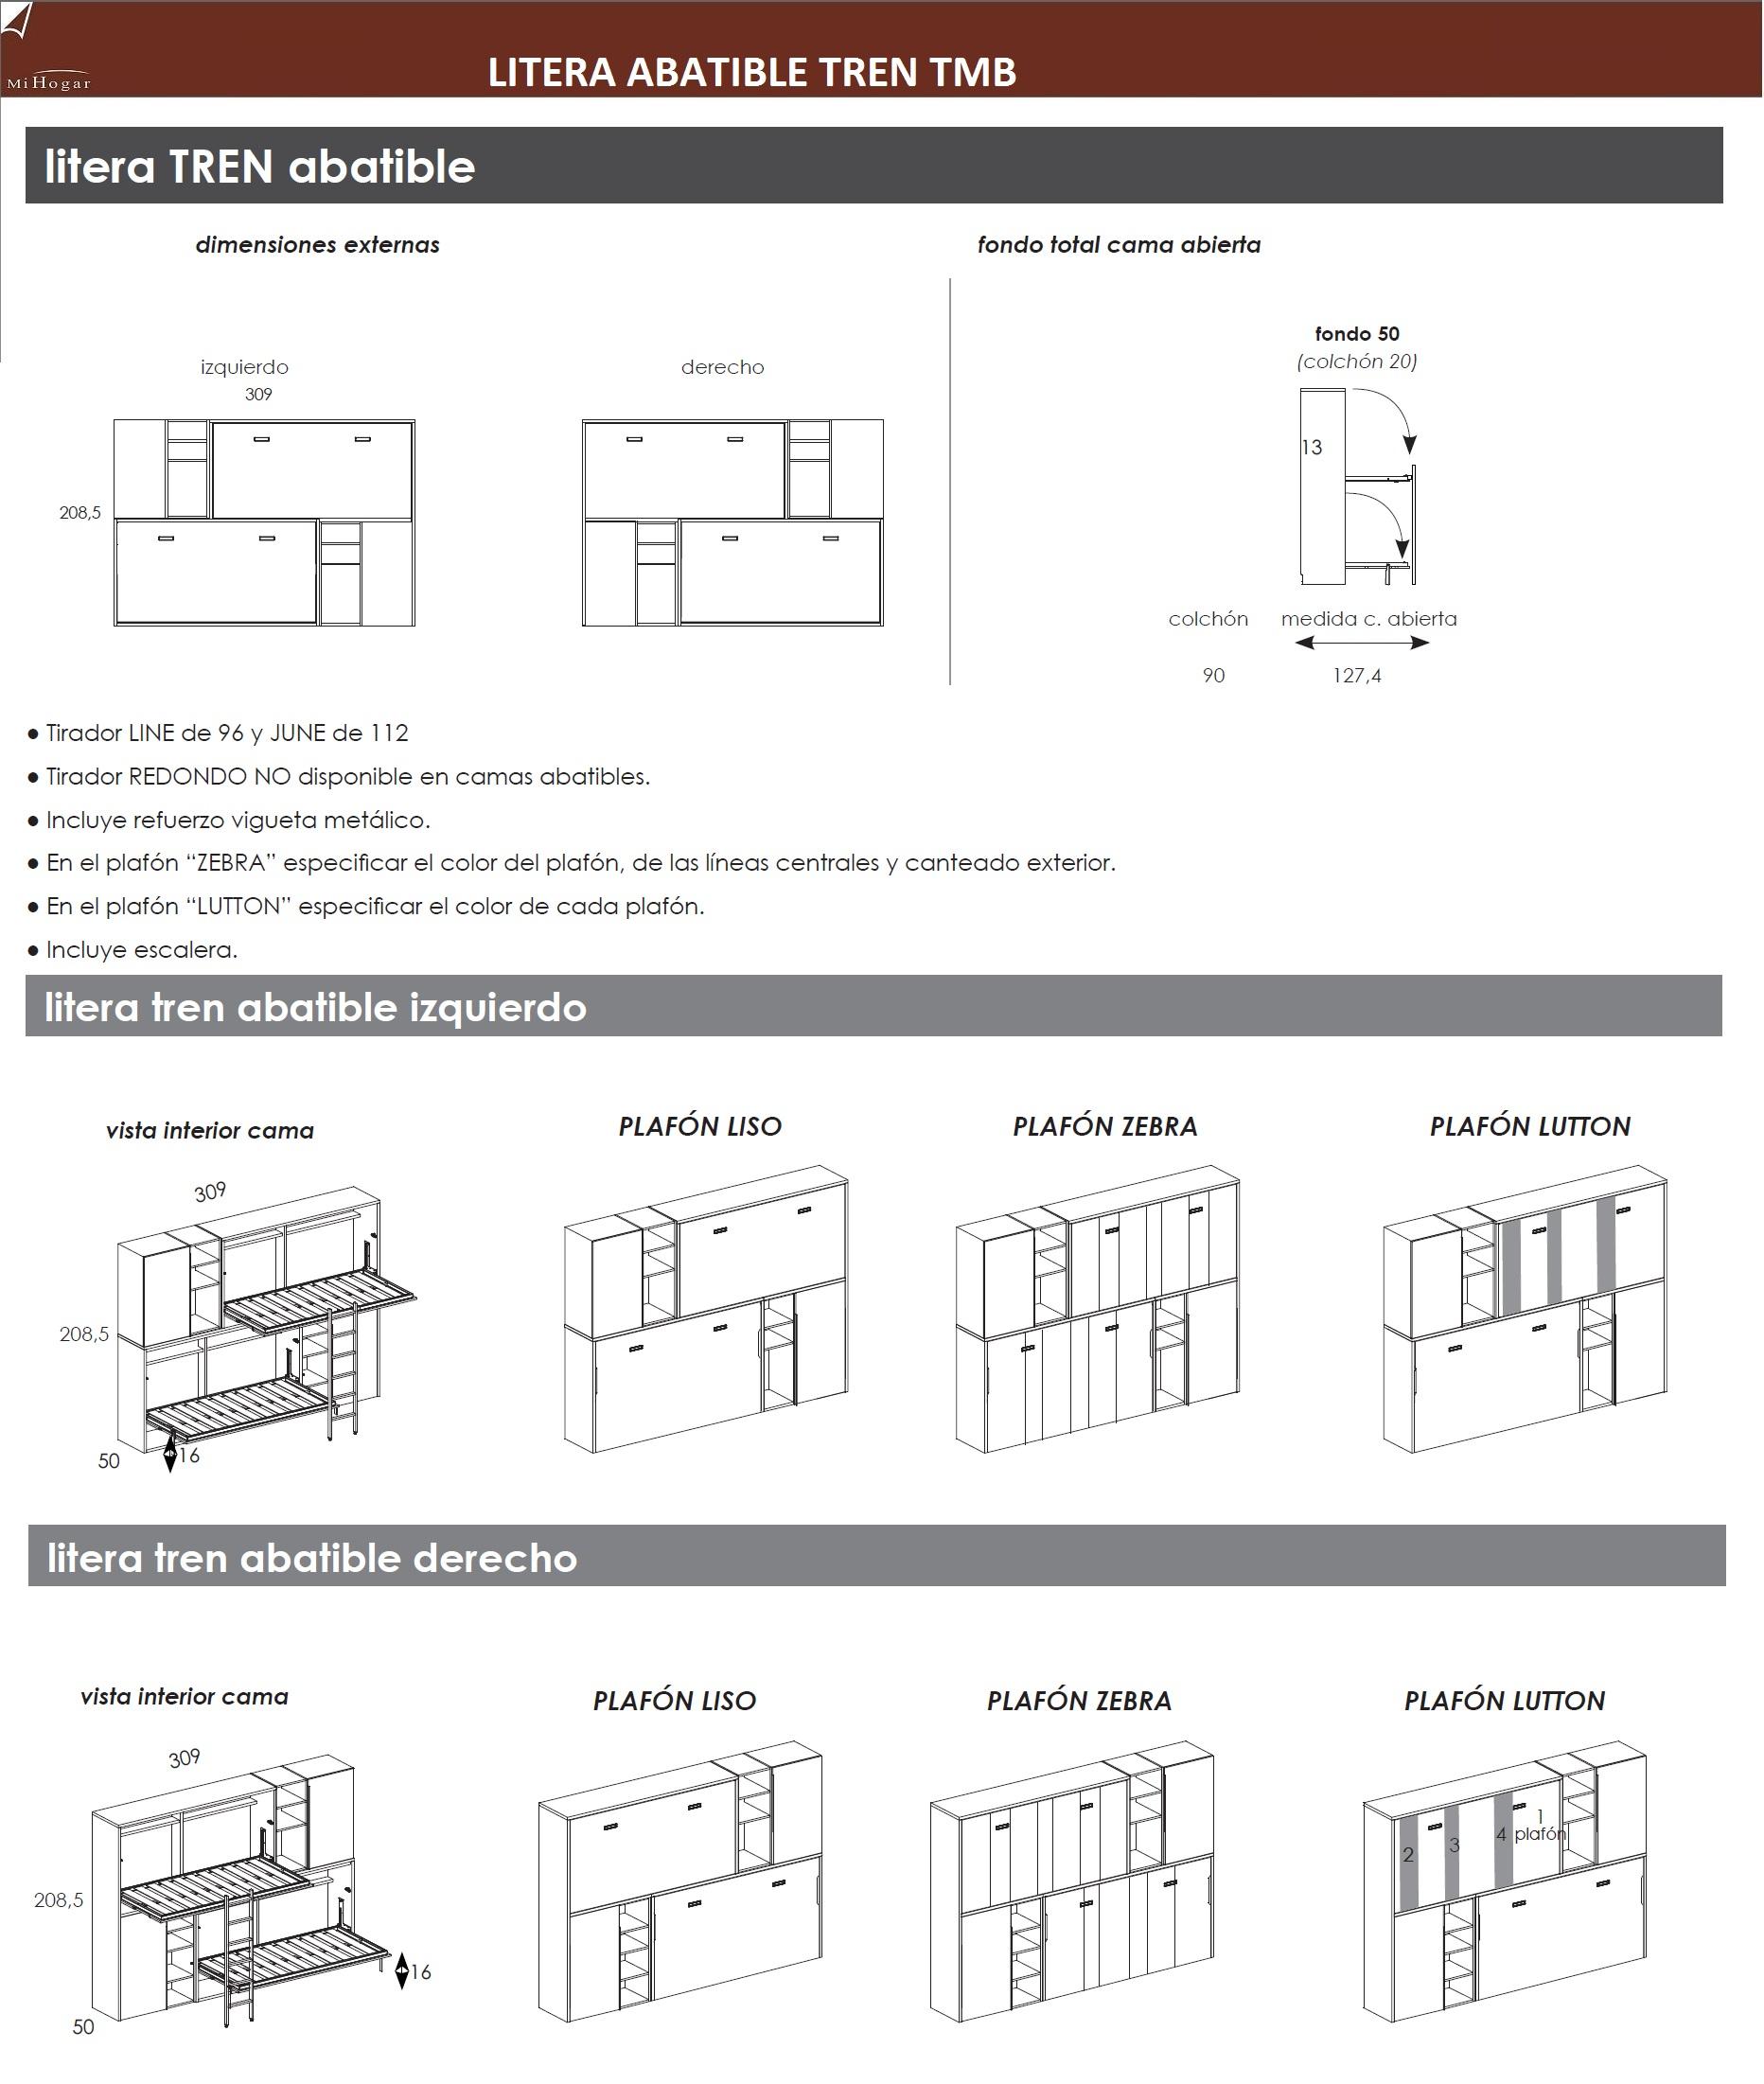 Litera abatible horizontal tmb muebles mi hogar - Literas tren medidas ...